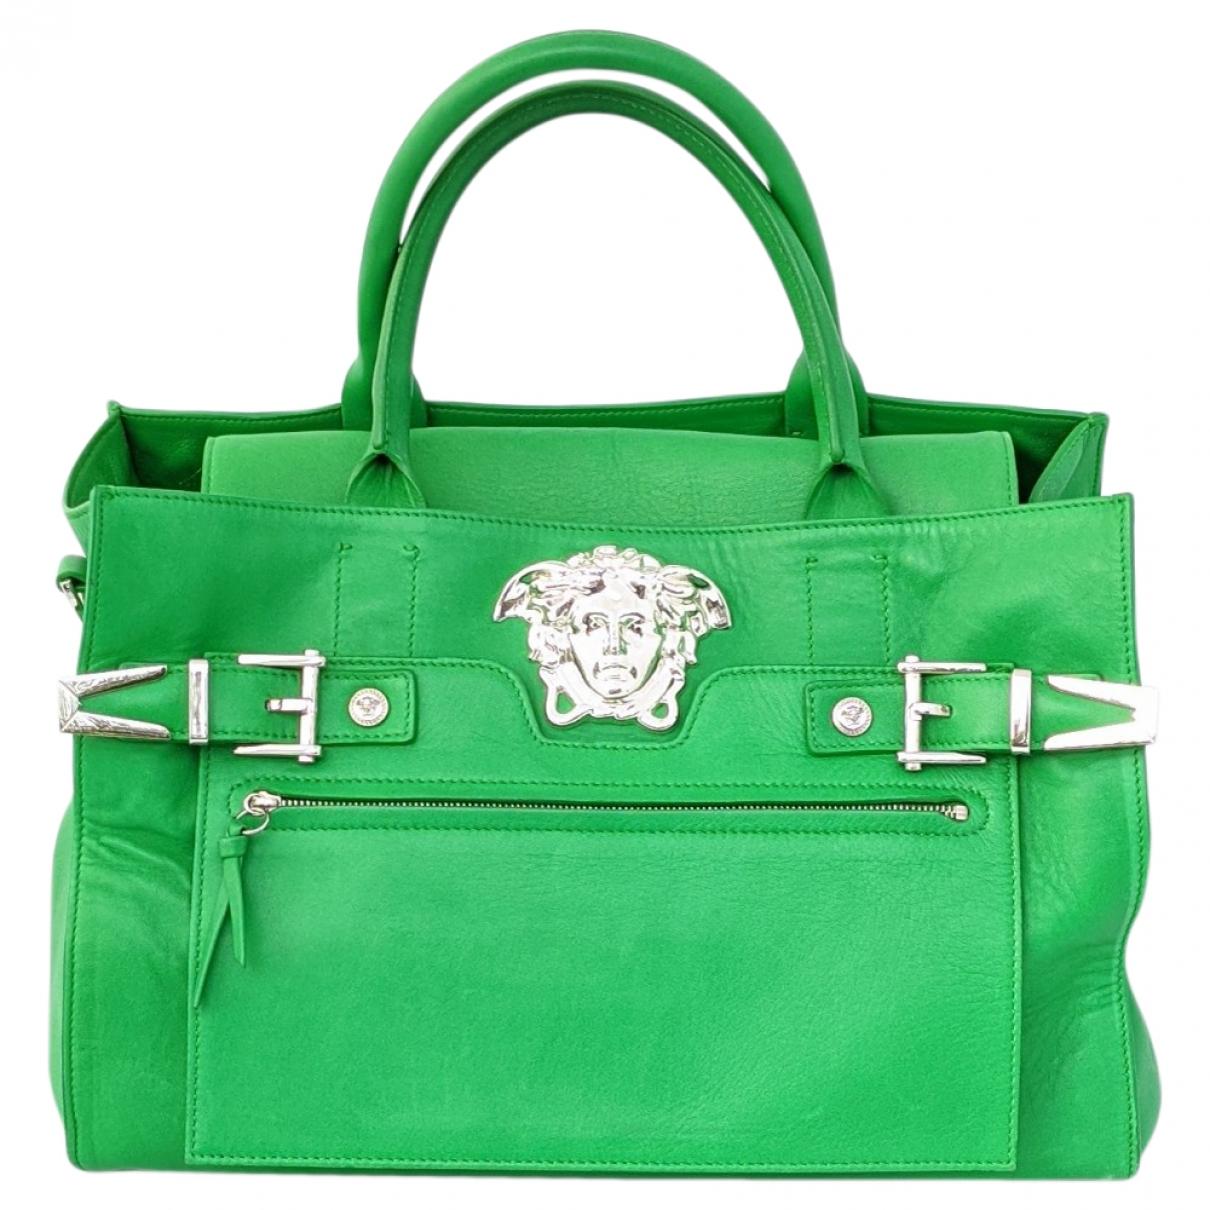 Versace - Sac a main   pour femme en cuir - vert